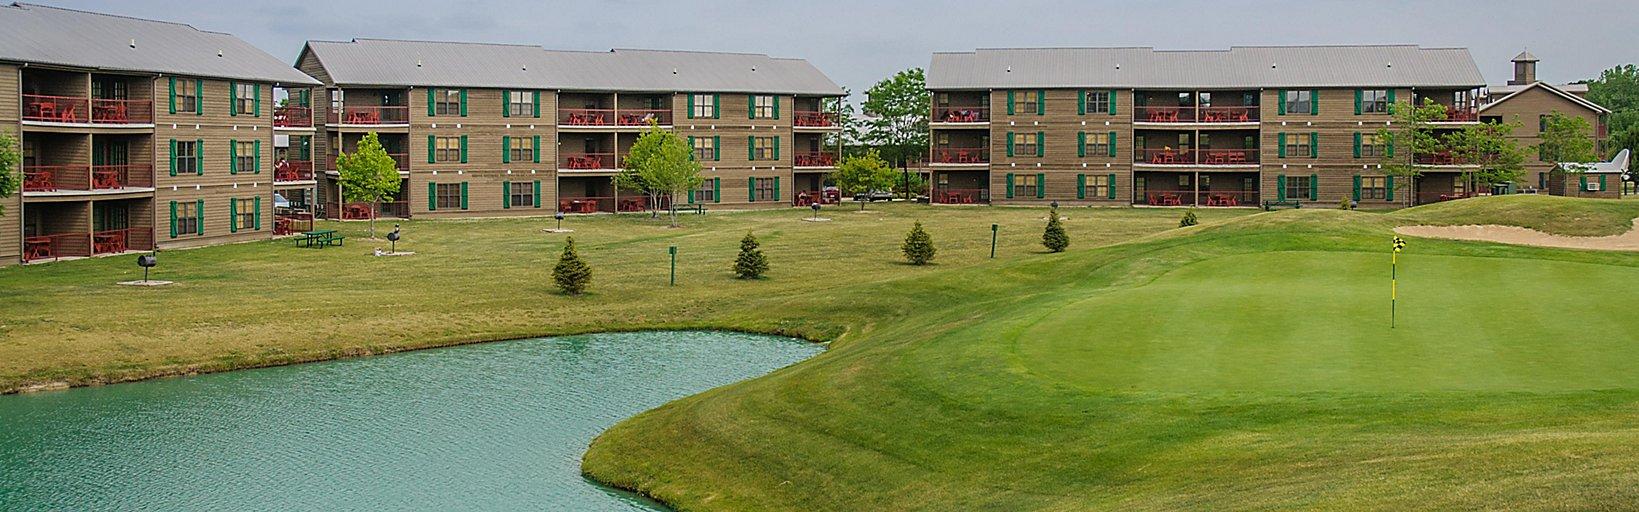 Holiday Inn Club Vacations Fox River Resort Hotel by IHG